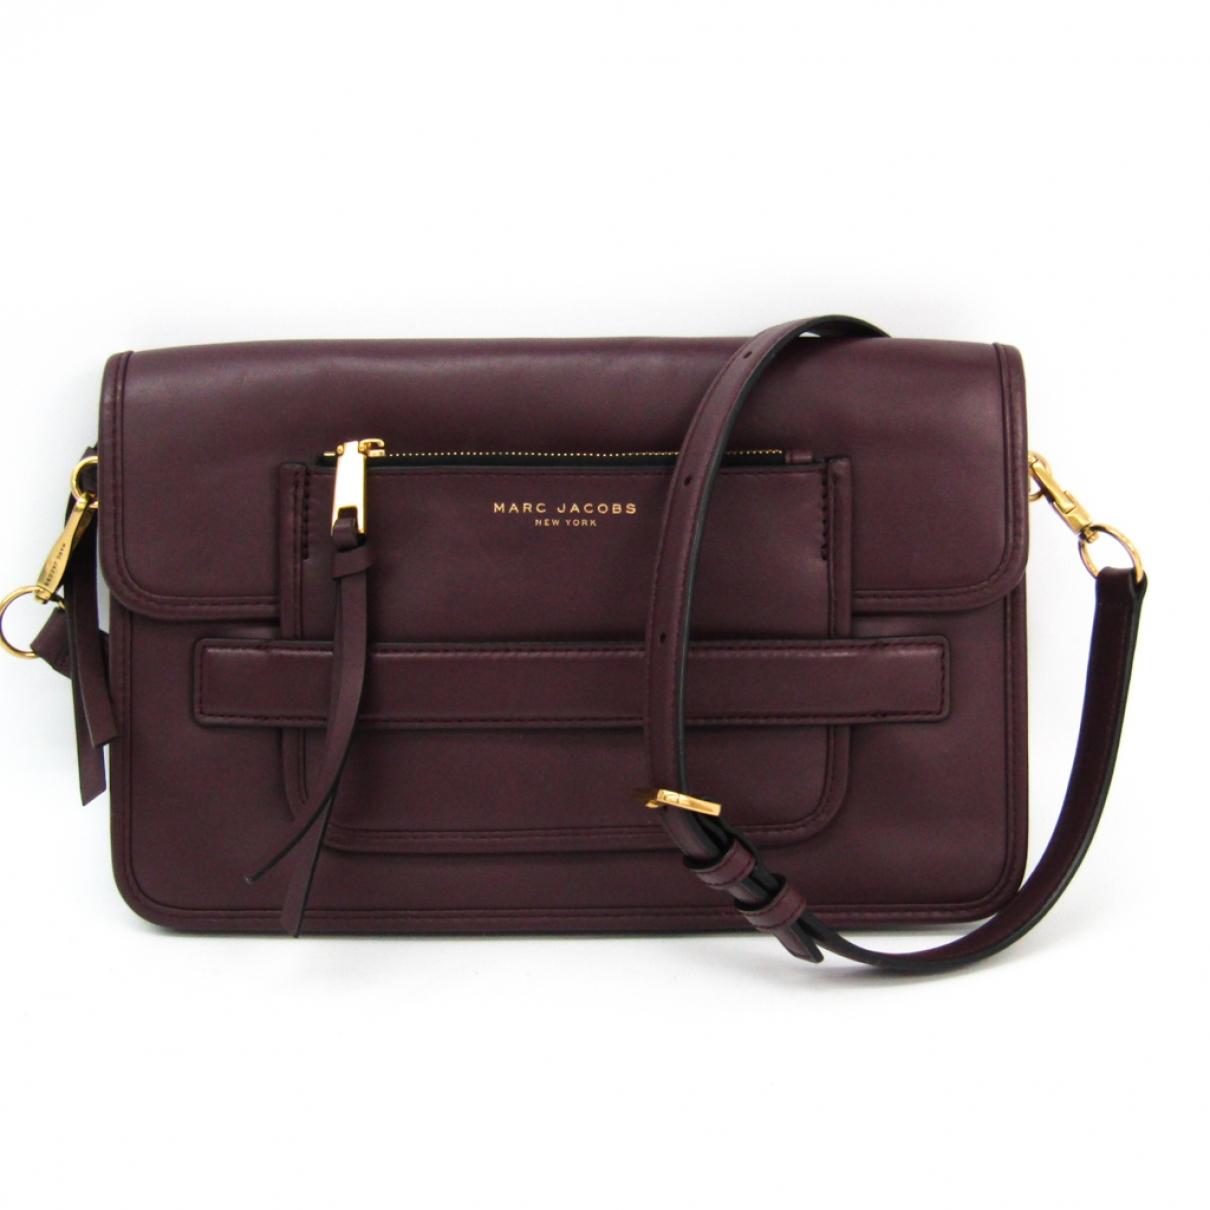 Marc Jacobs \N Burgundy Leather handbag for Women \N